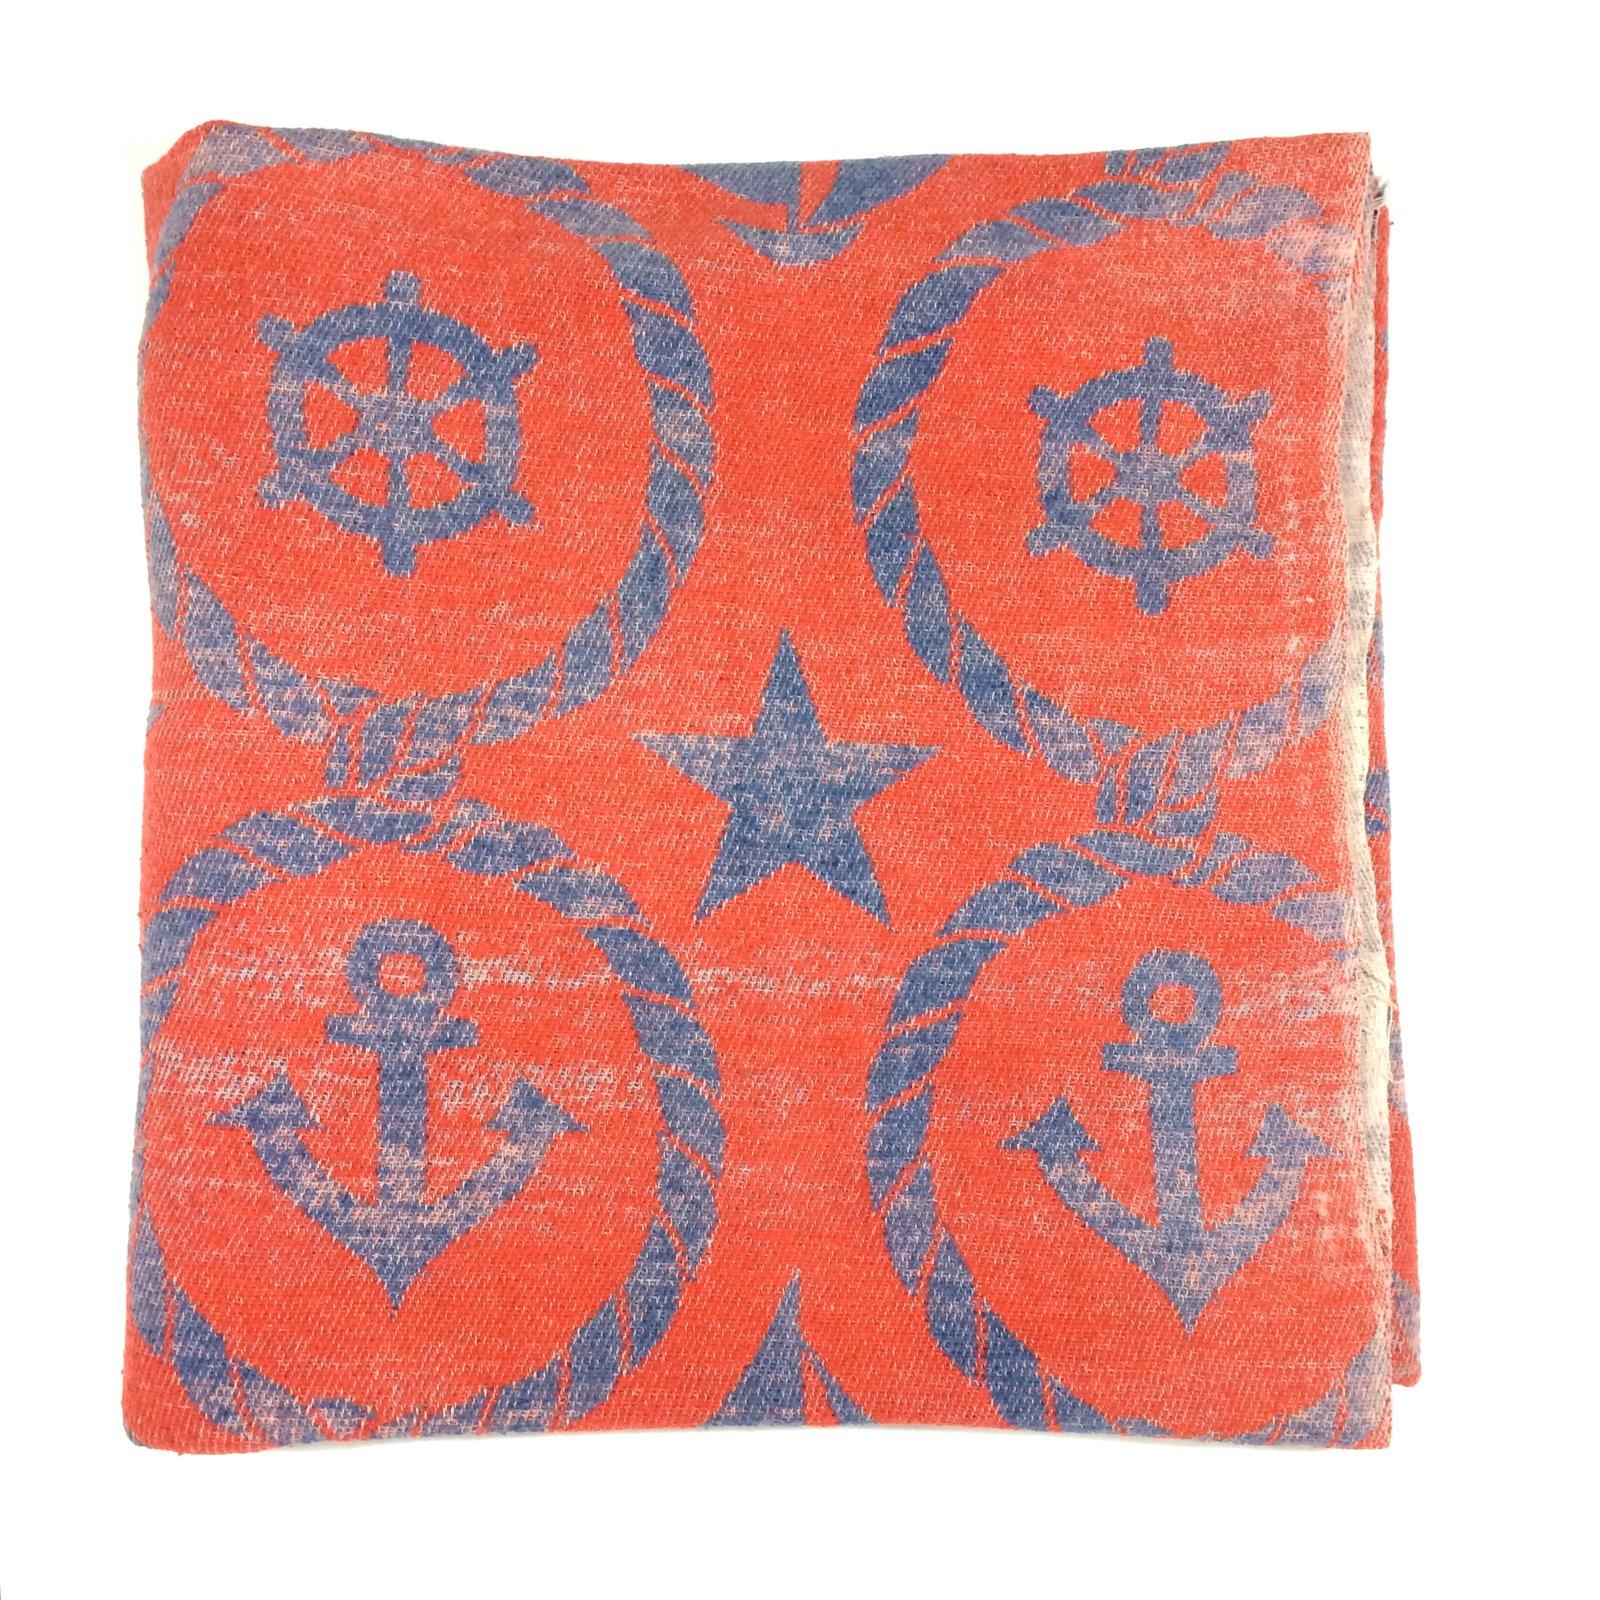 Image of vintage beacon blanket nautical style